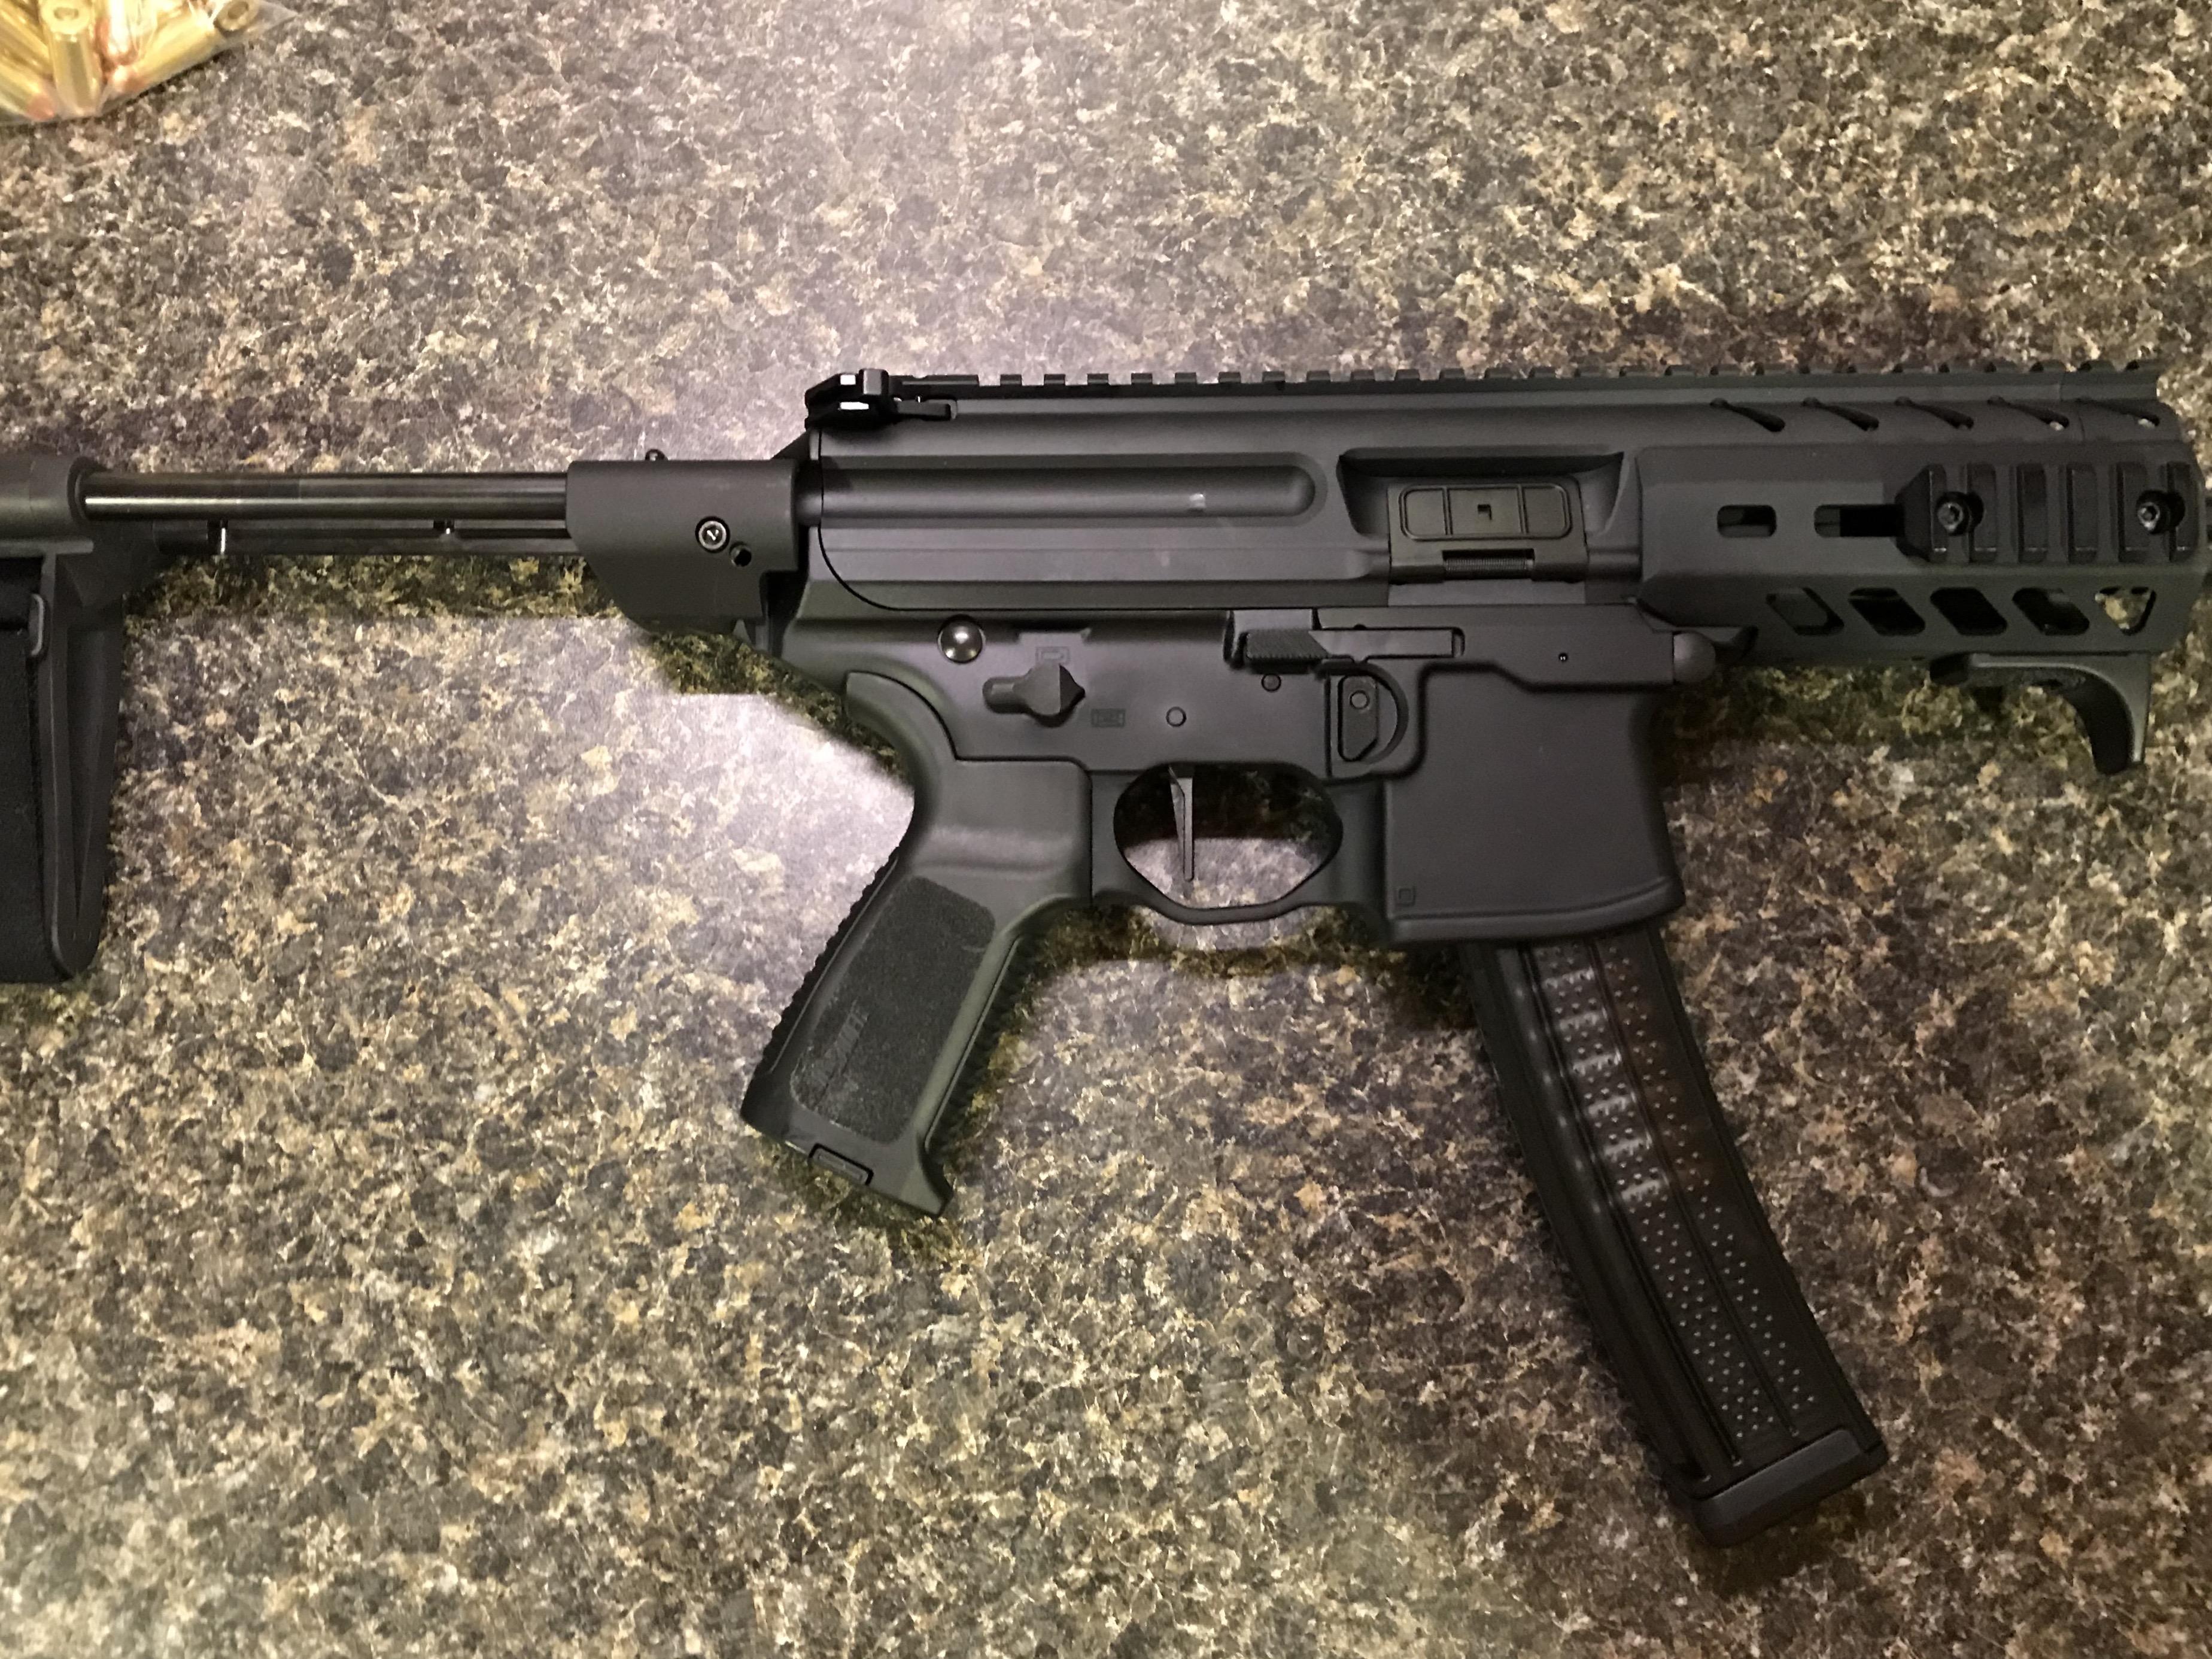 WTS:  SIG MPX-K 9mm Pistol-bc460cc8-e11d-4092-89c8-f84317a34fa6.jpeg